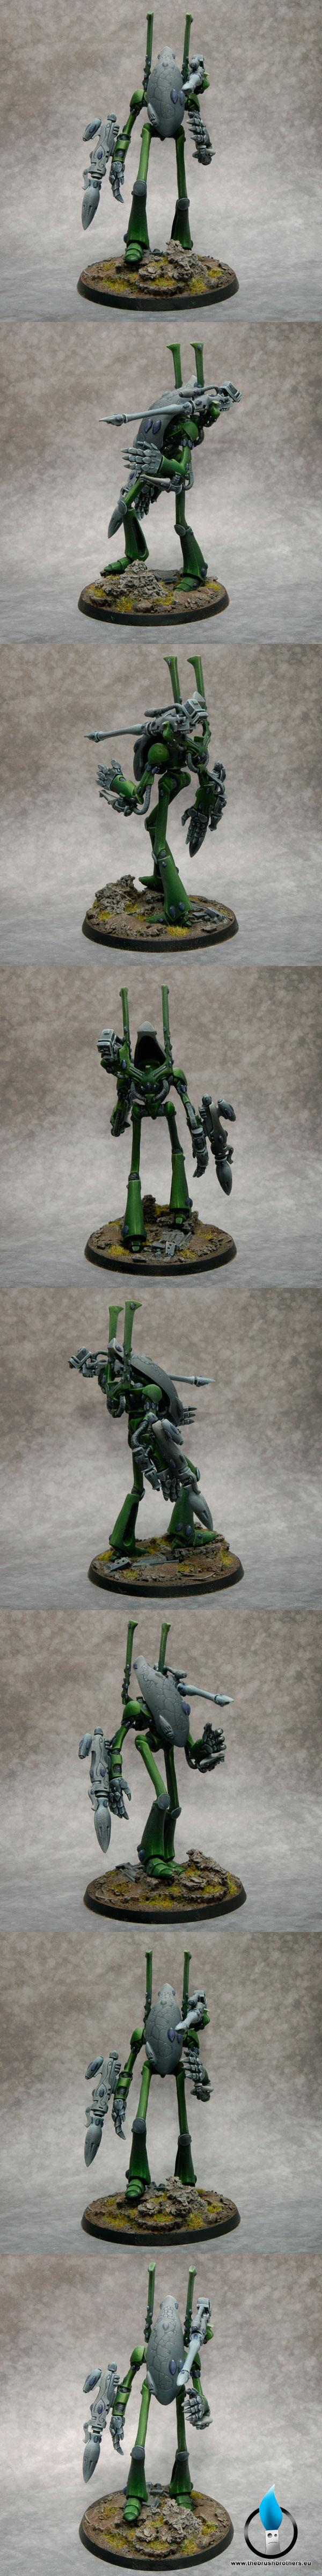 Eldar, Eml, Wraithlord